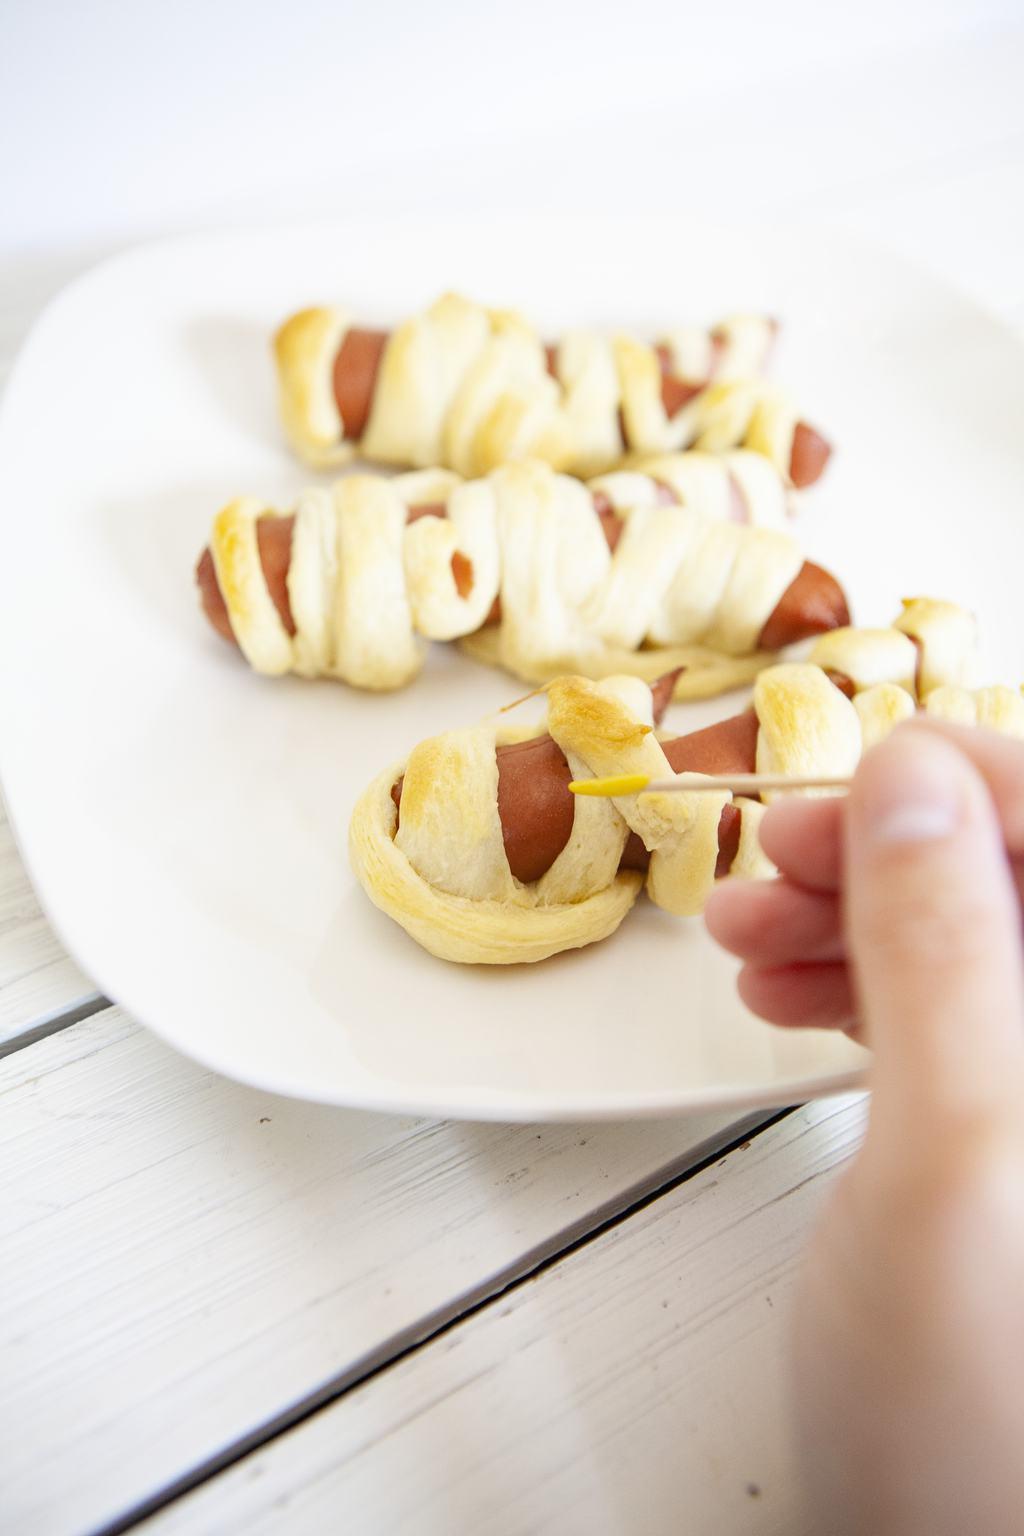 Mummy Hotdogs